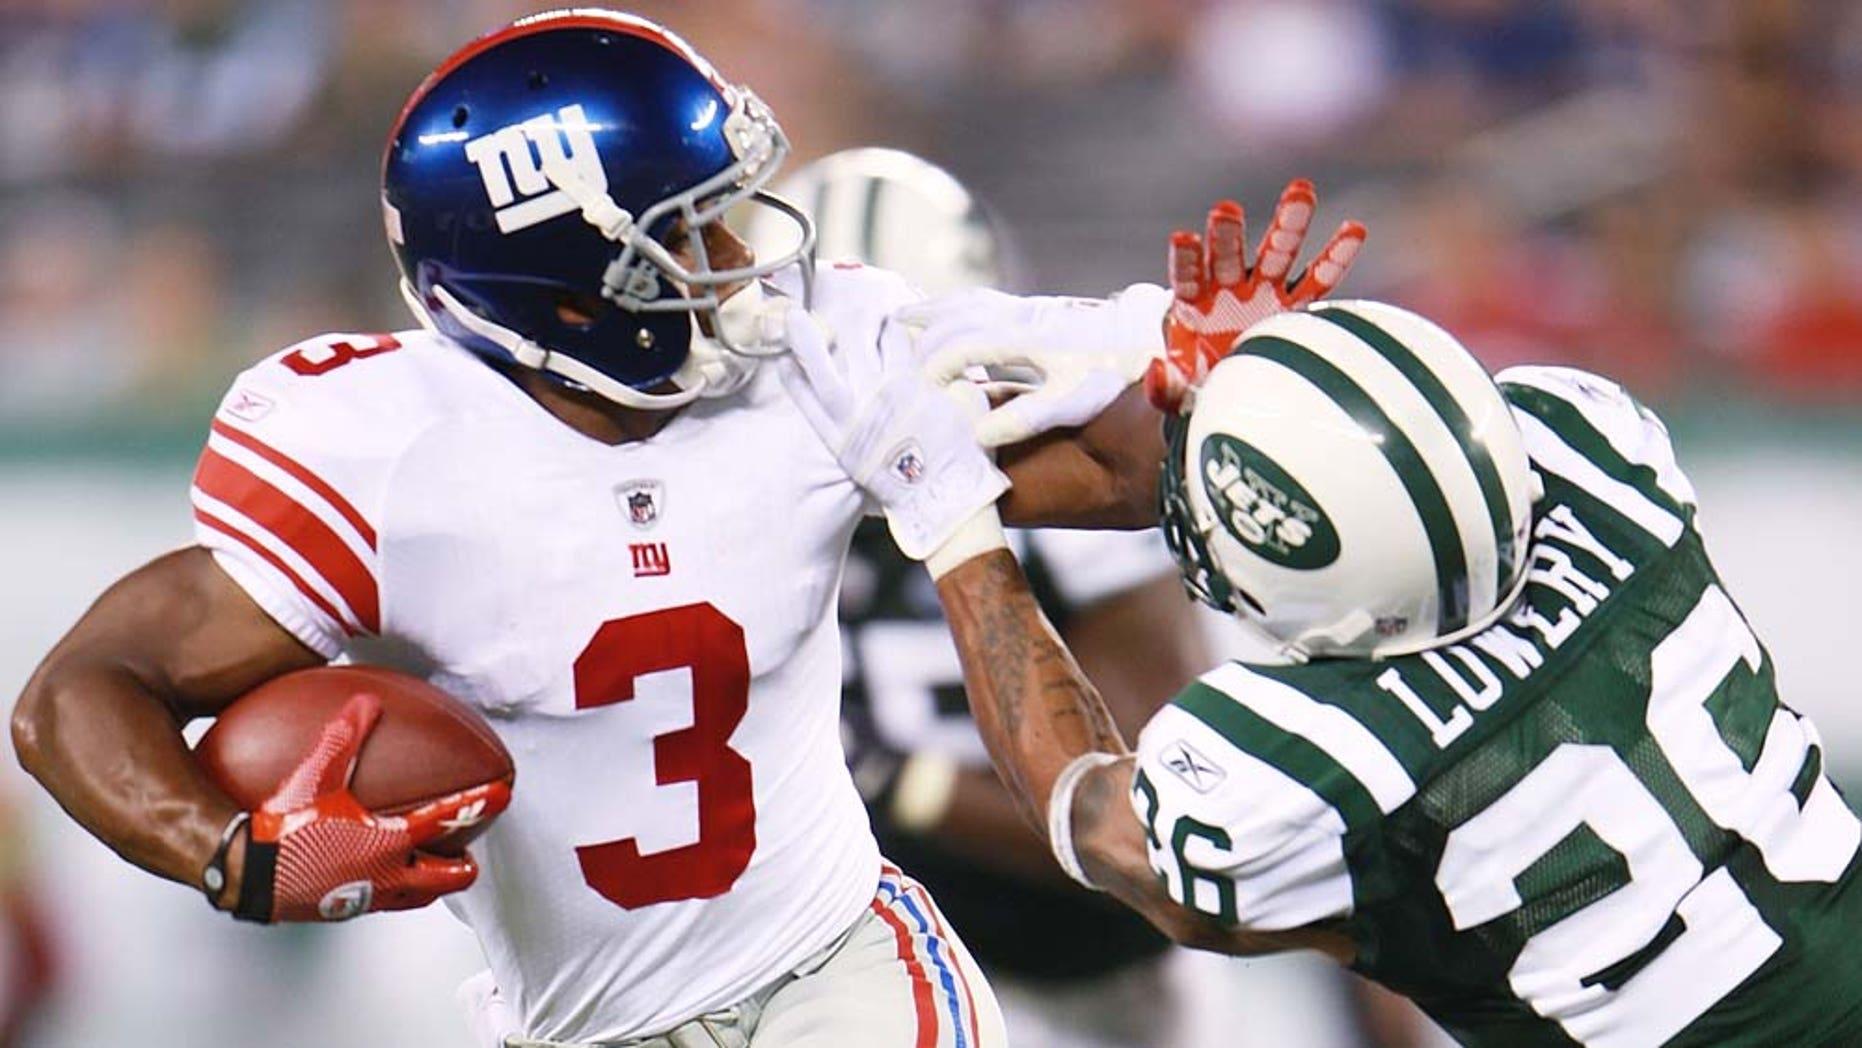 New York Giants Victor Cruz fights off Jets defender.